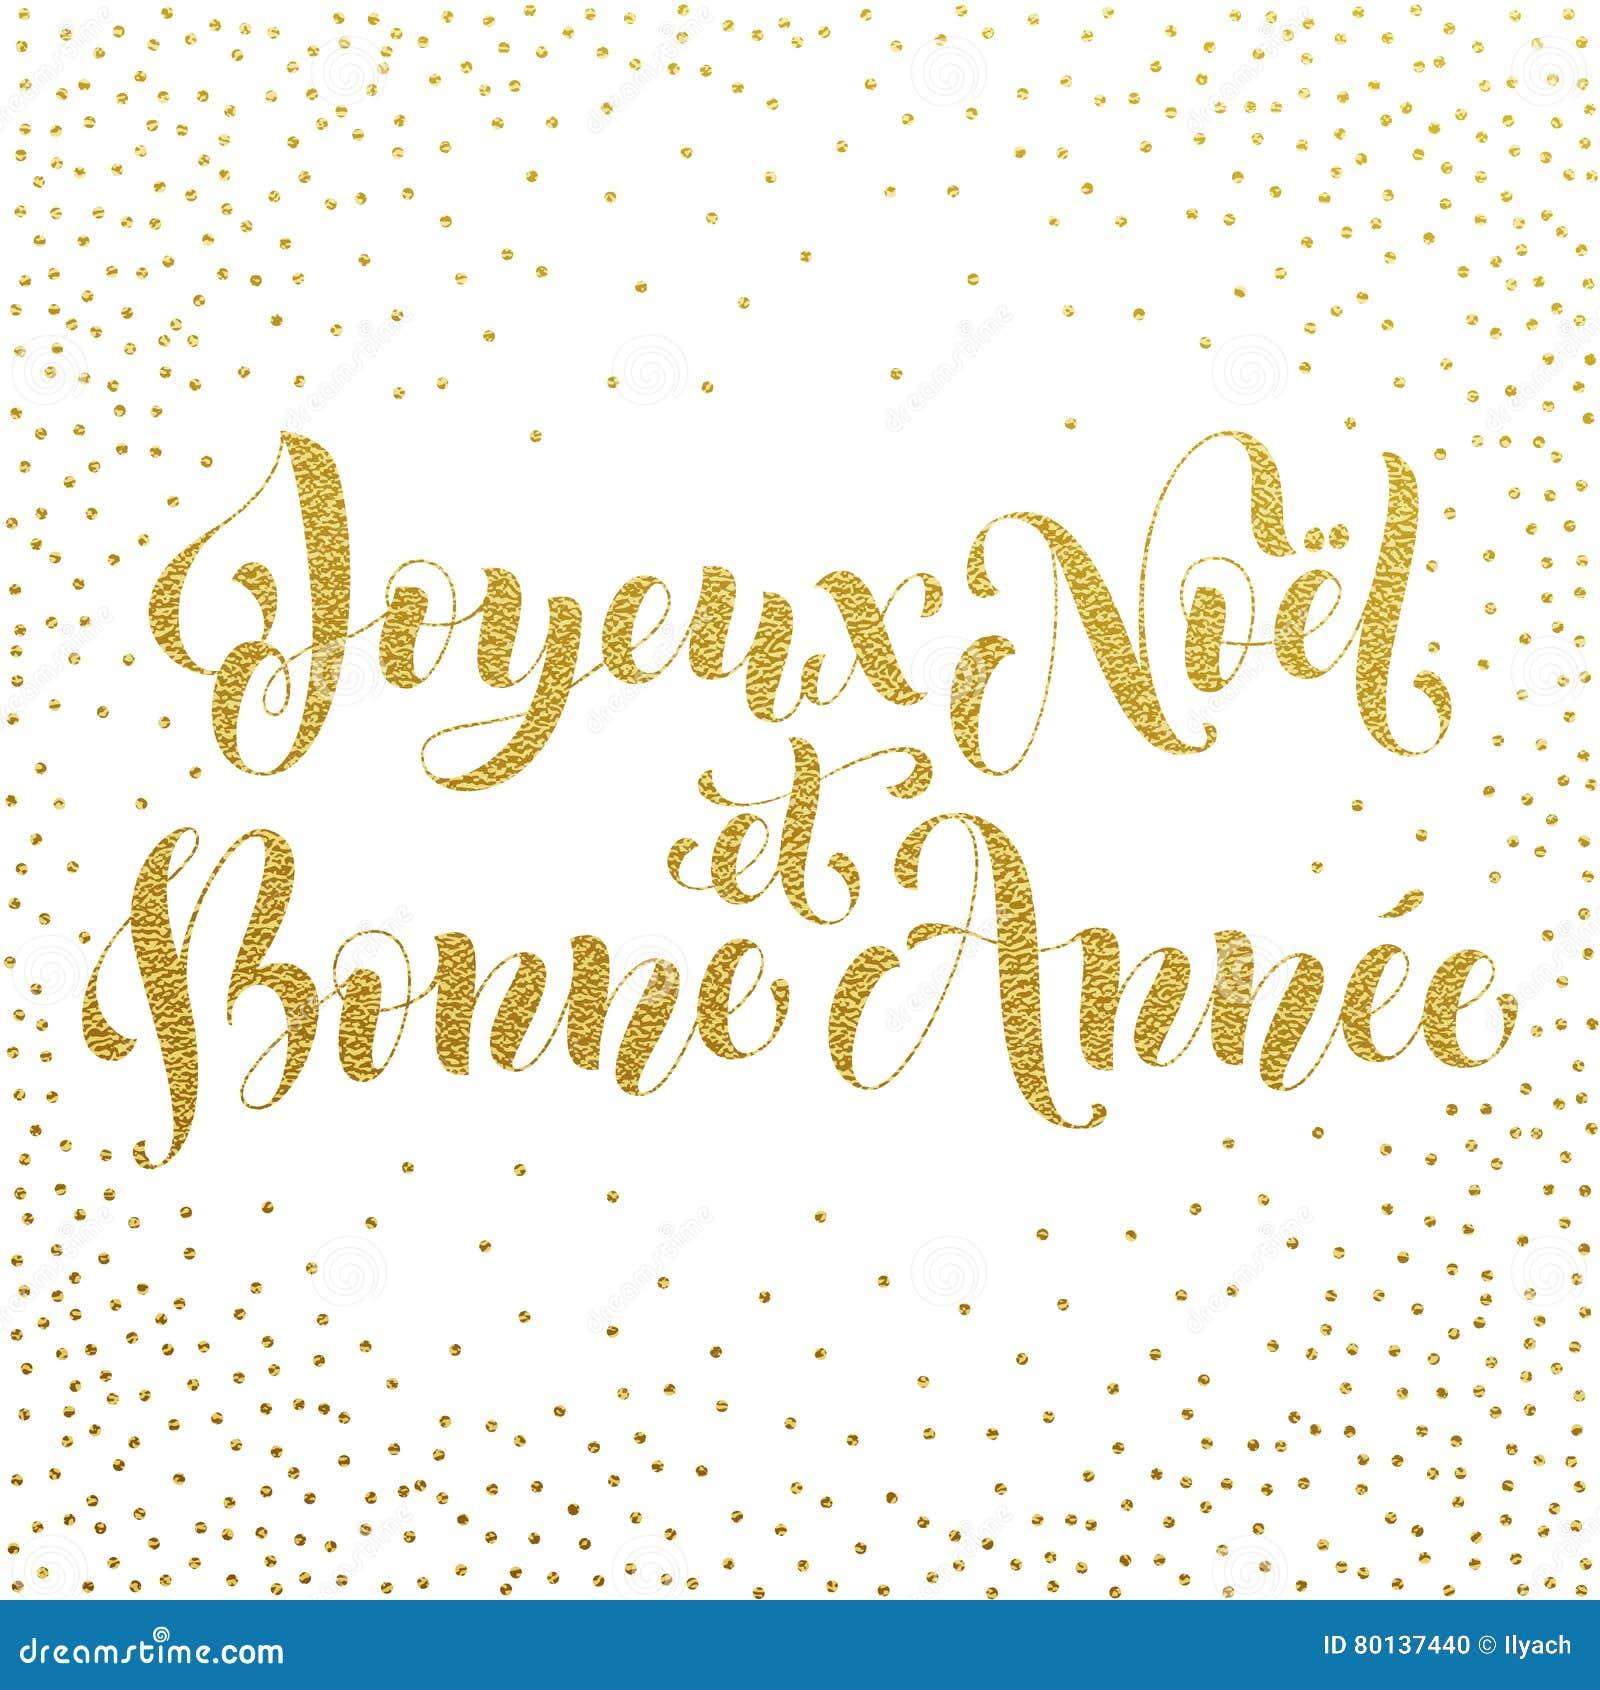 Joyeux noel bonne annee french greeting card poster stock download joyeux noel bonne annee french greeting card poster stock illustration illustration of m4hsunfo